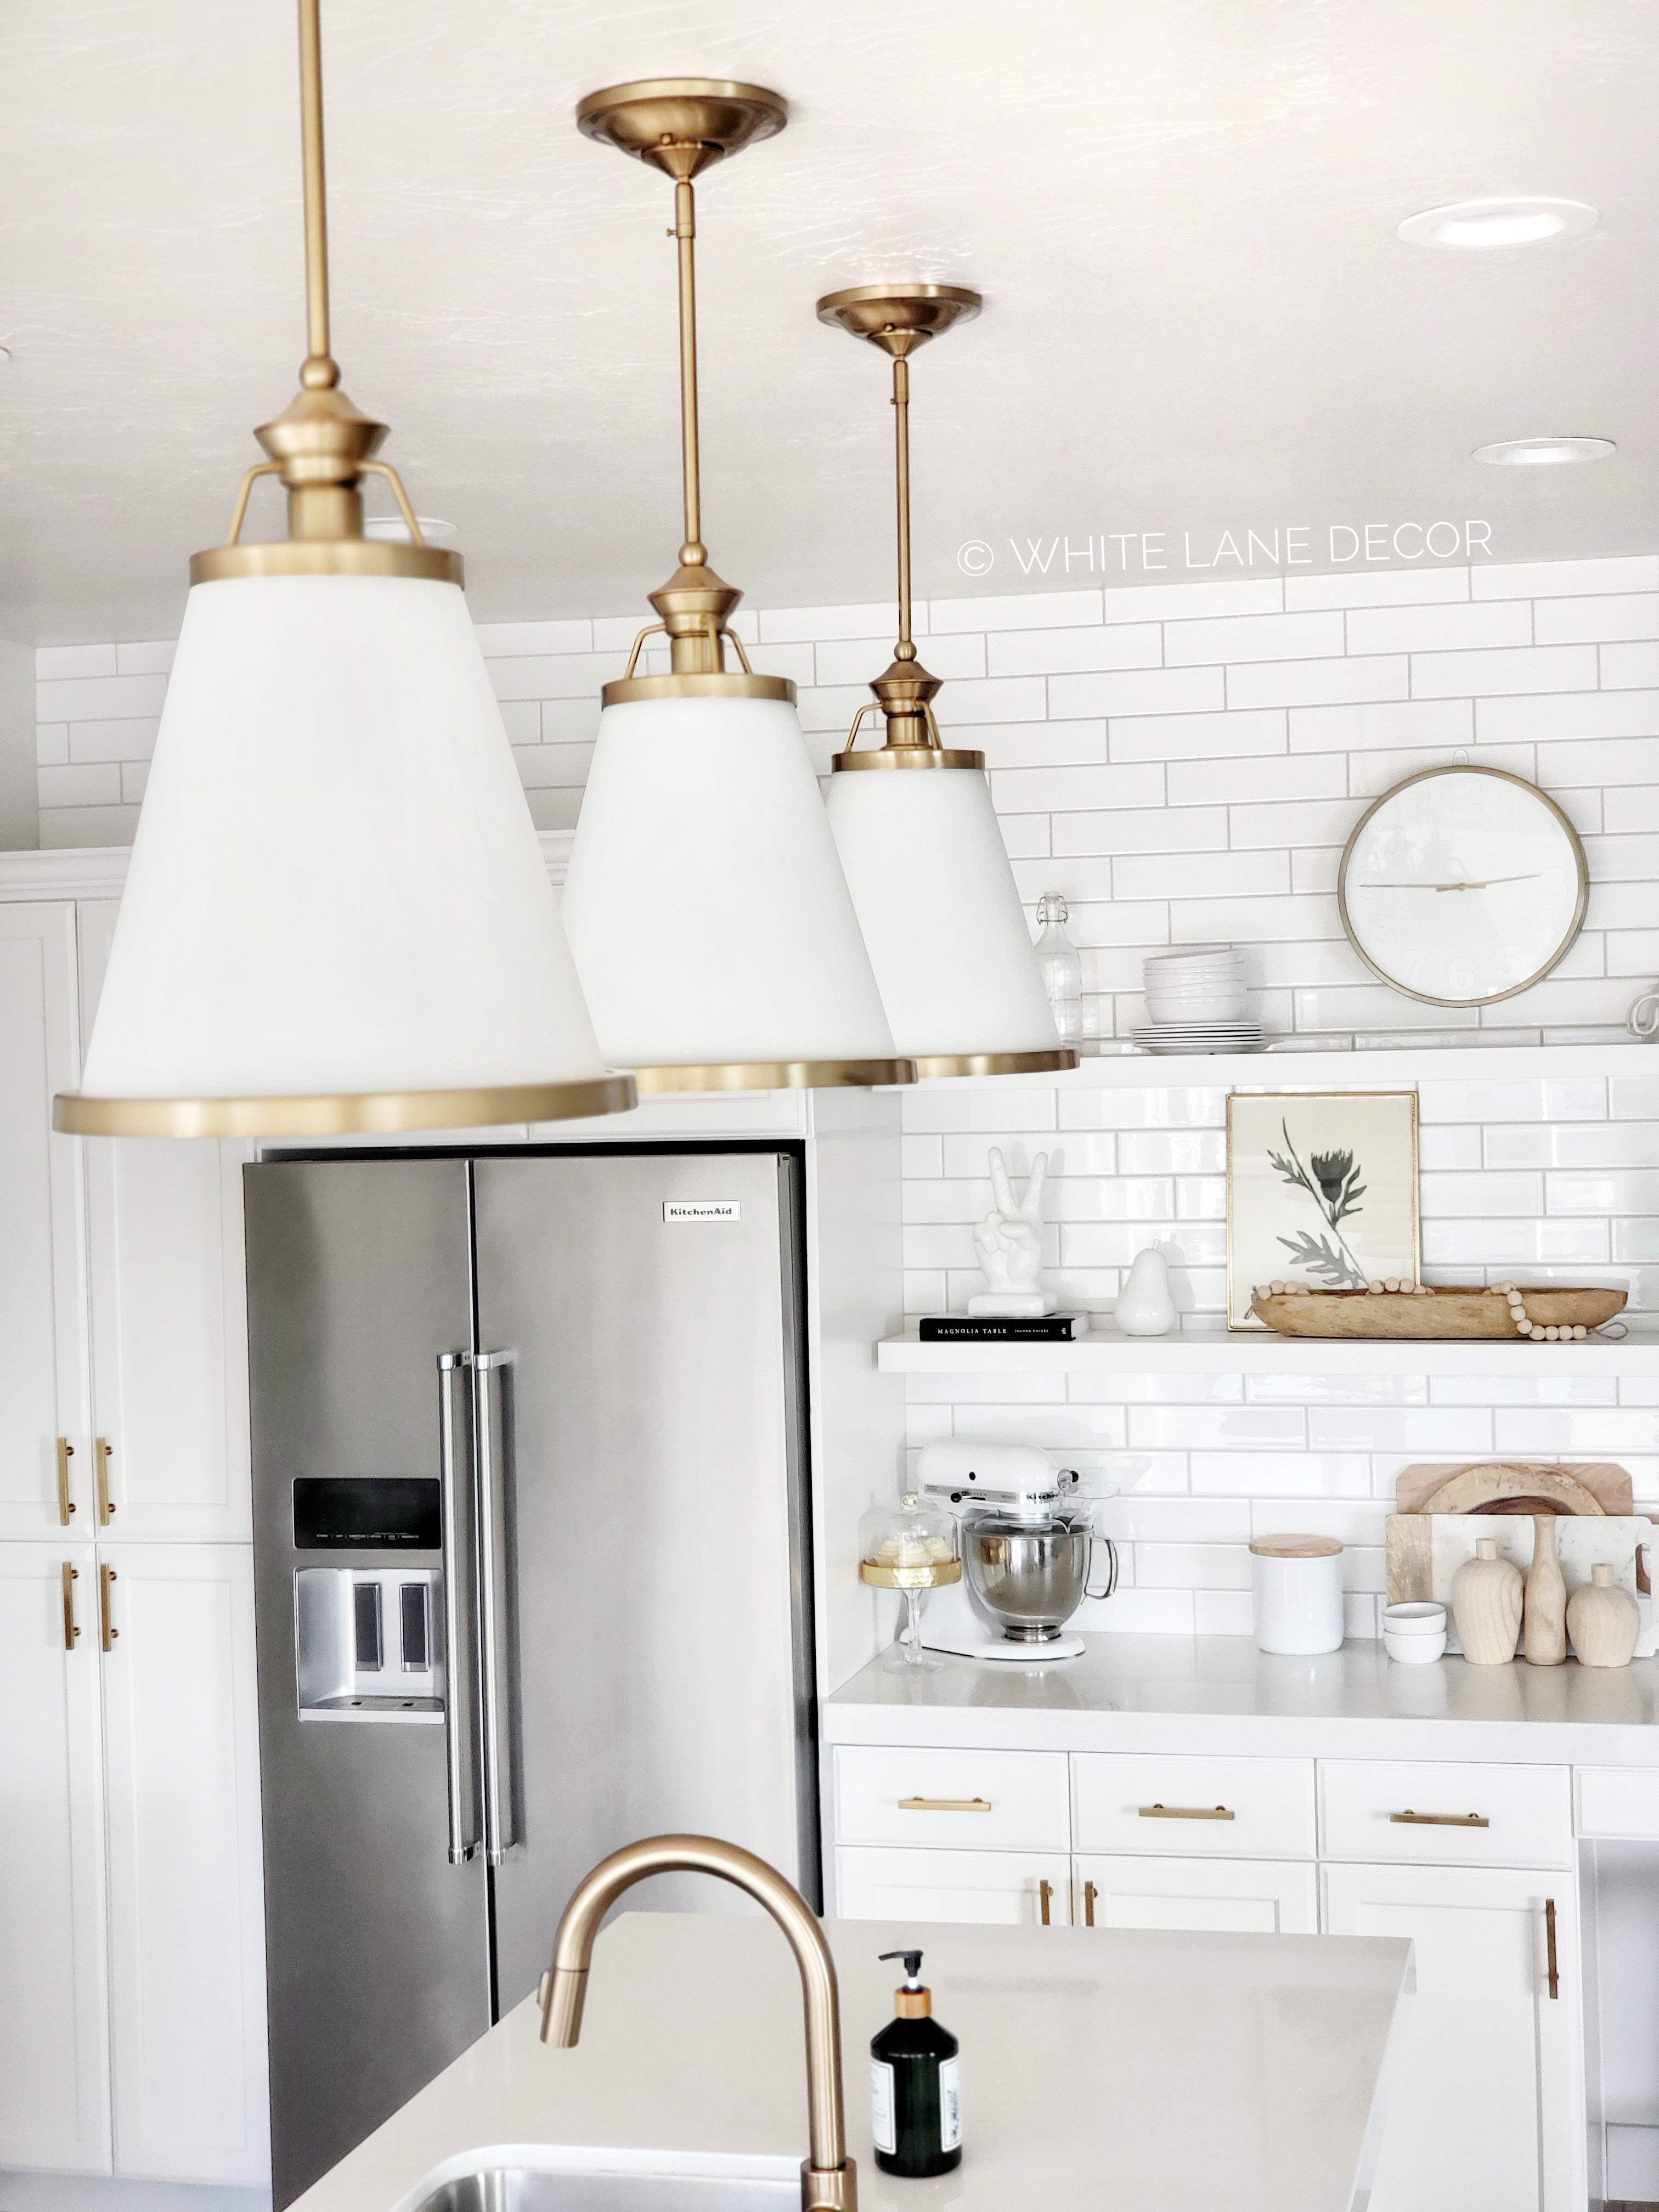 Gold And White Kitchen White Lane Decor Gold Kitchen Faucet Replacing Kitchen Countertops Gold Kitchen White kitchen island pendant lighting